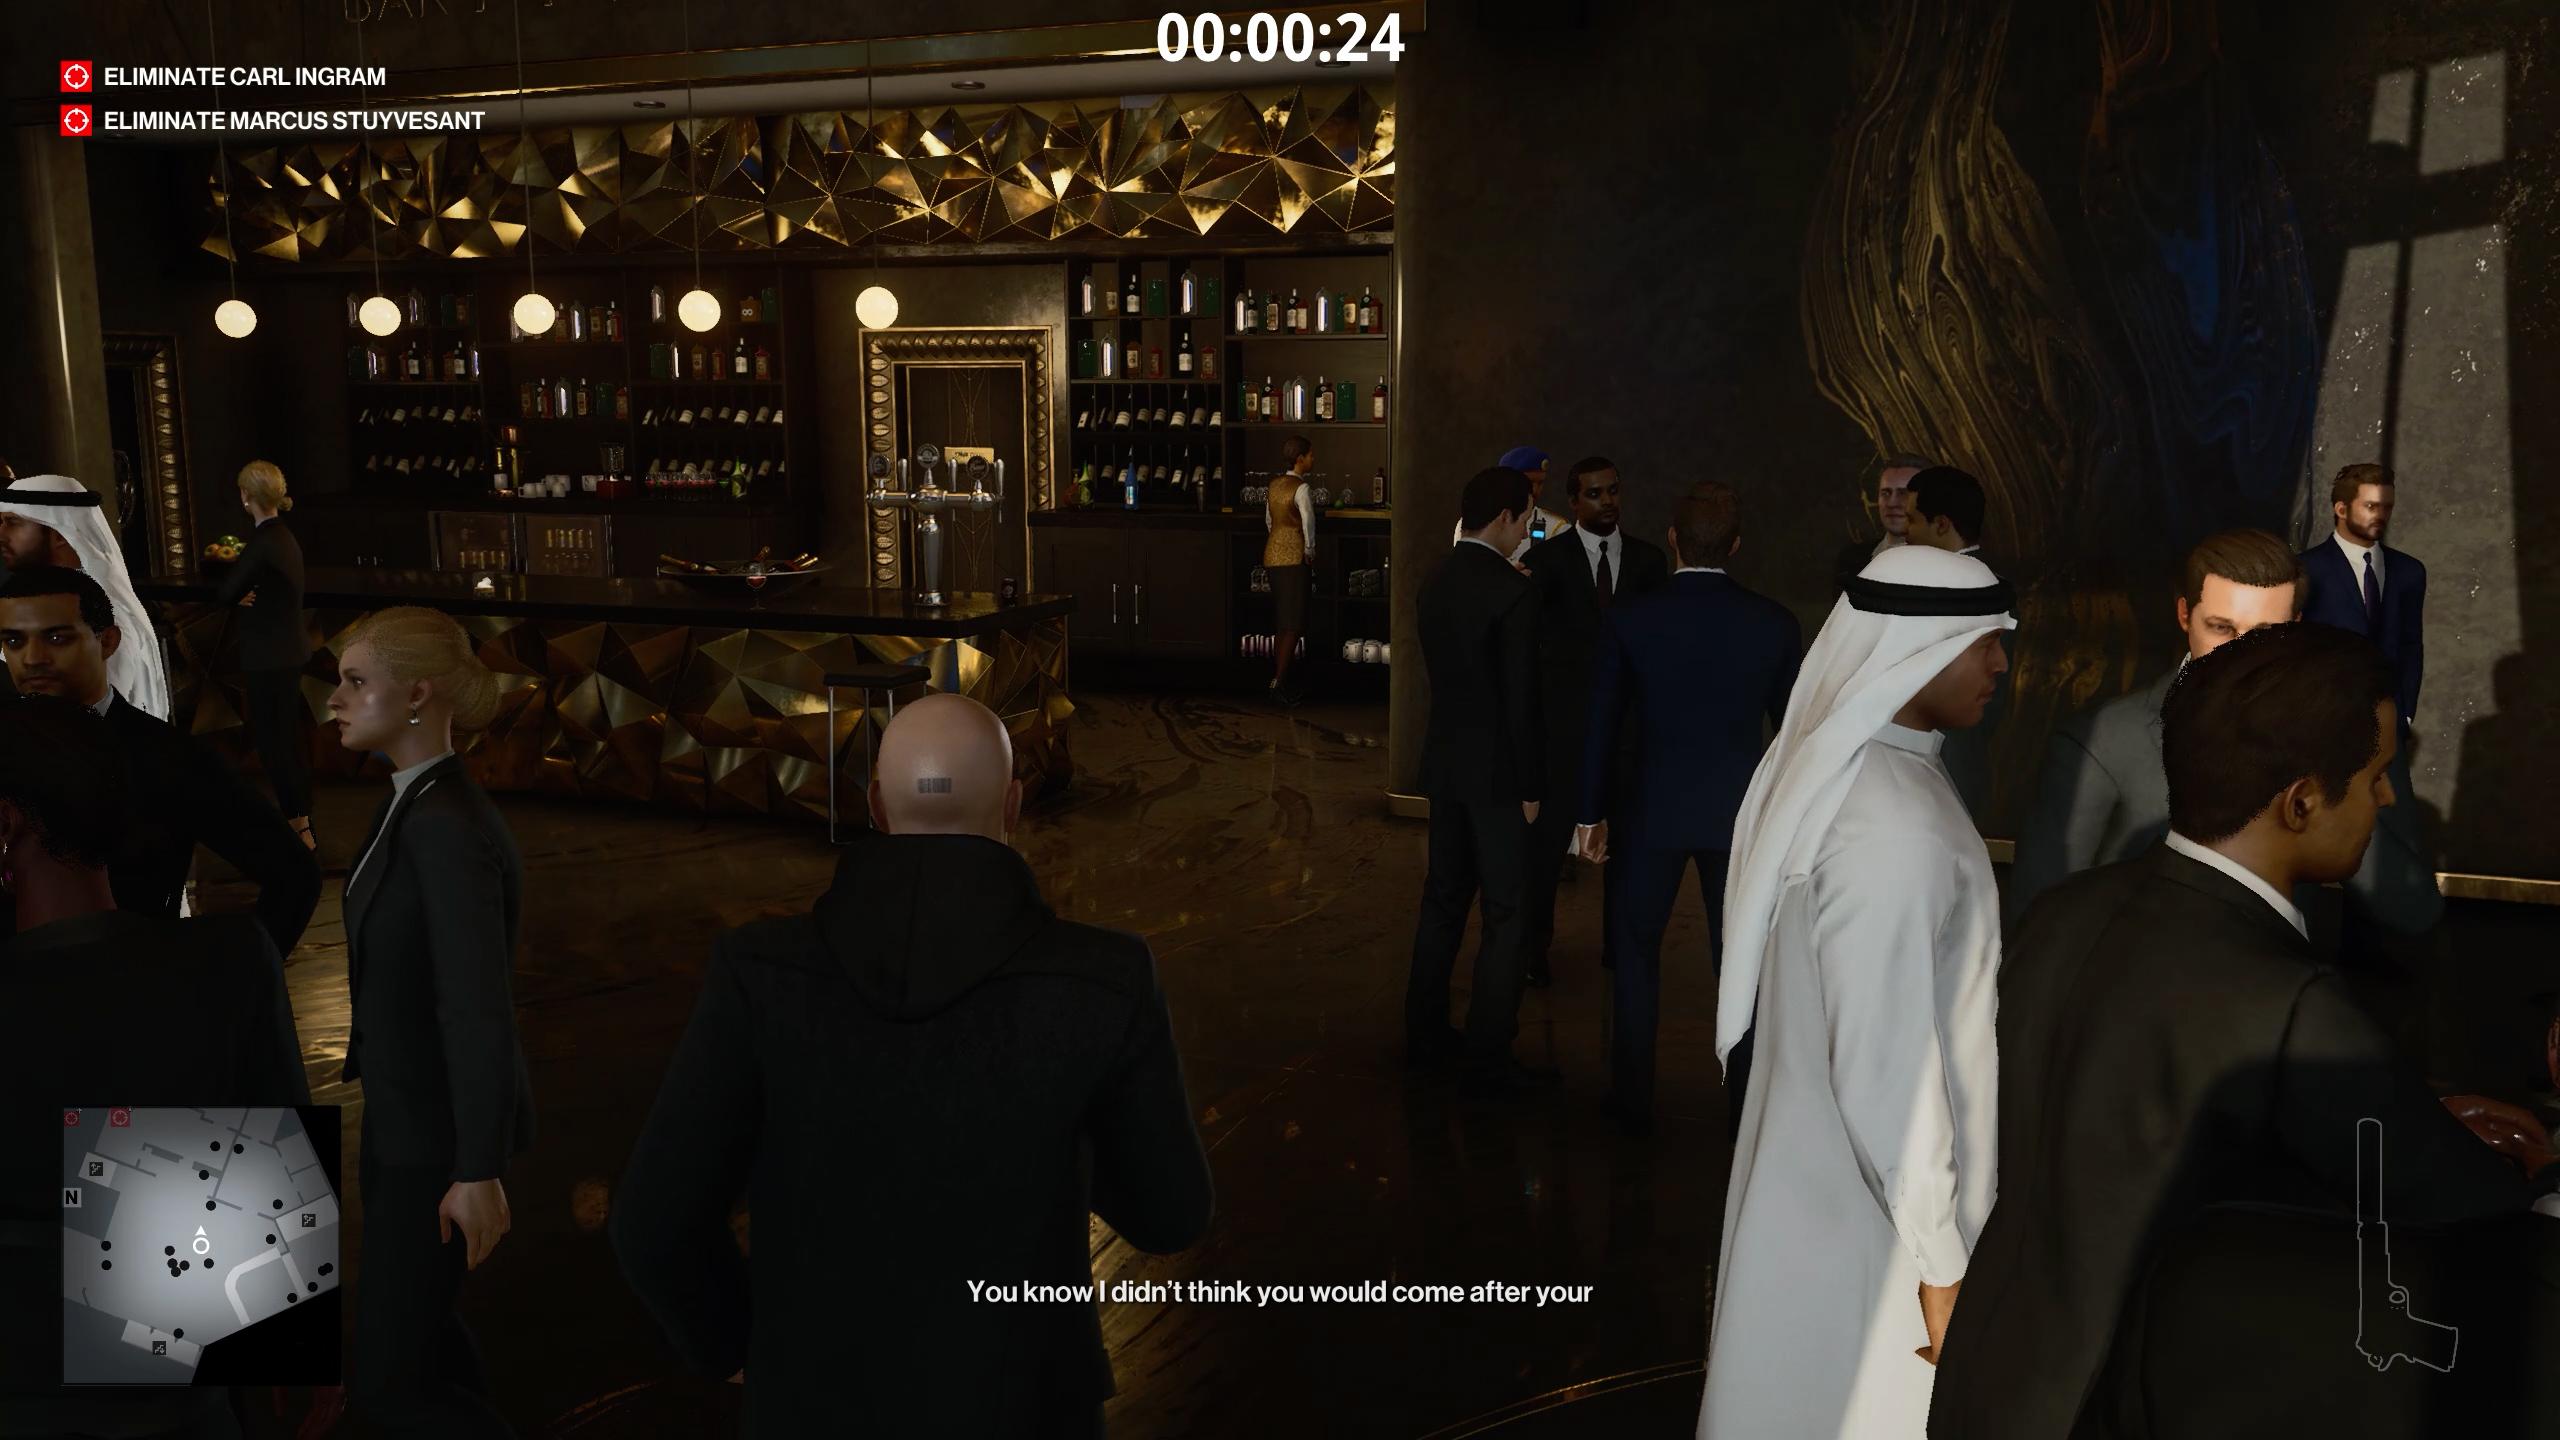 how to unlock elevators - hitman 3 - staff room